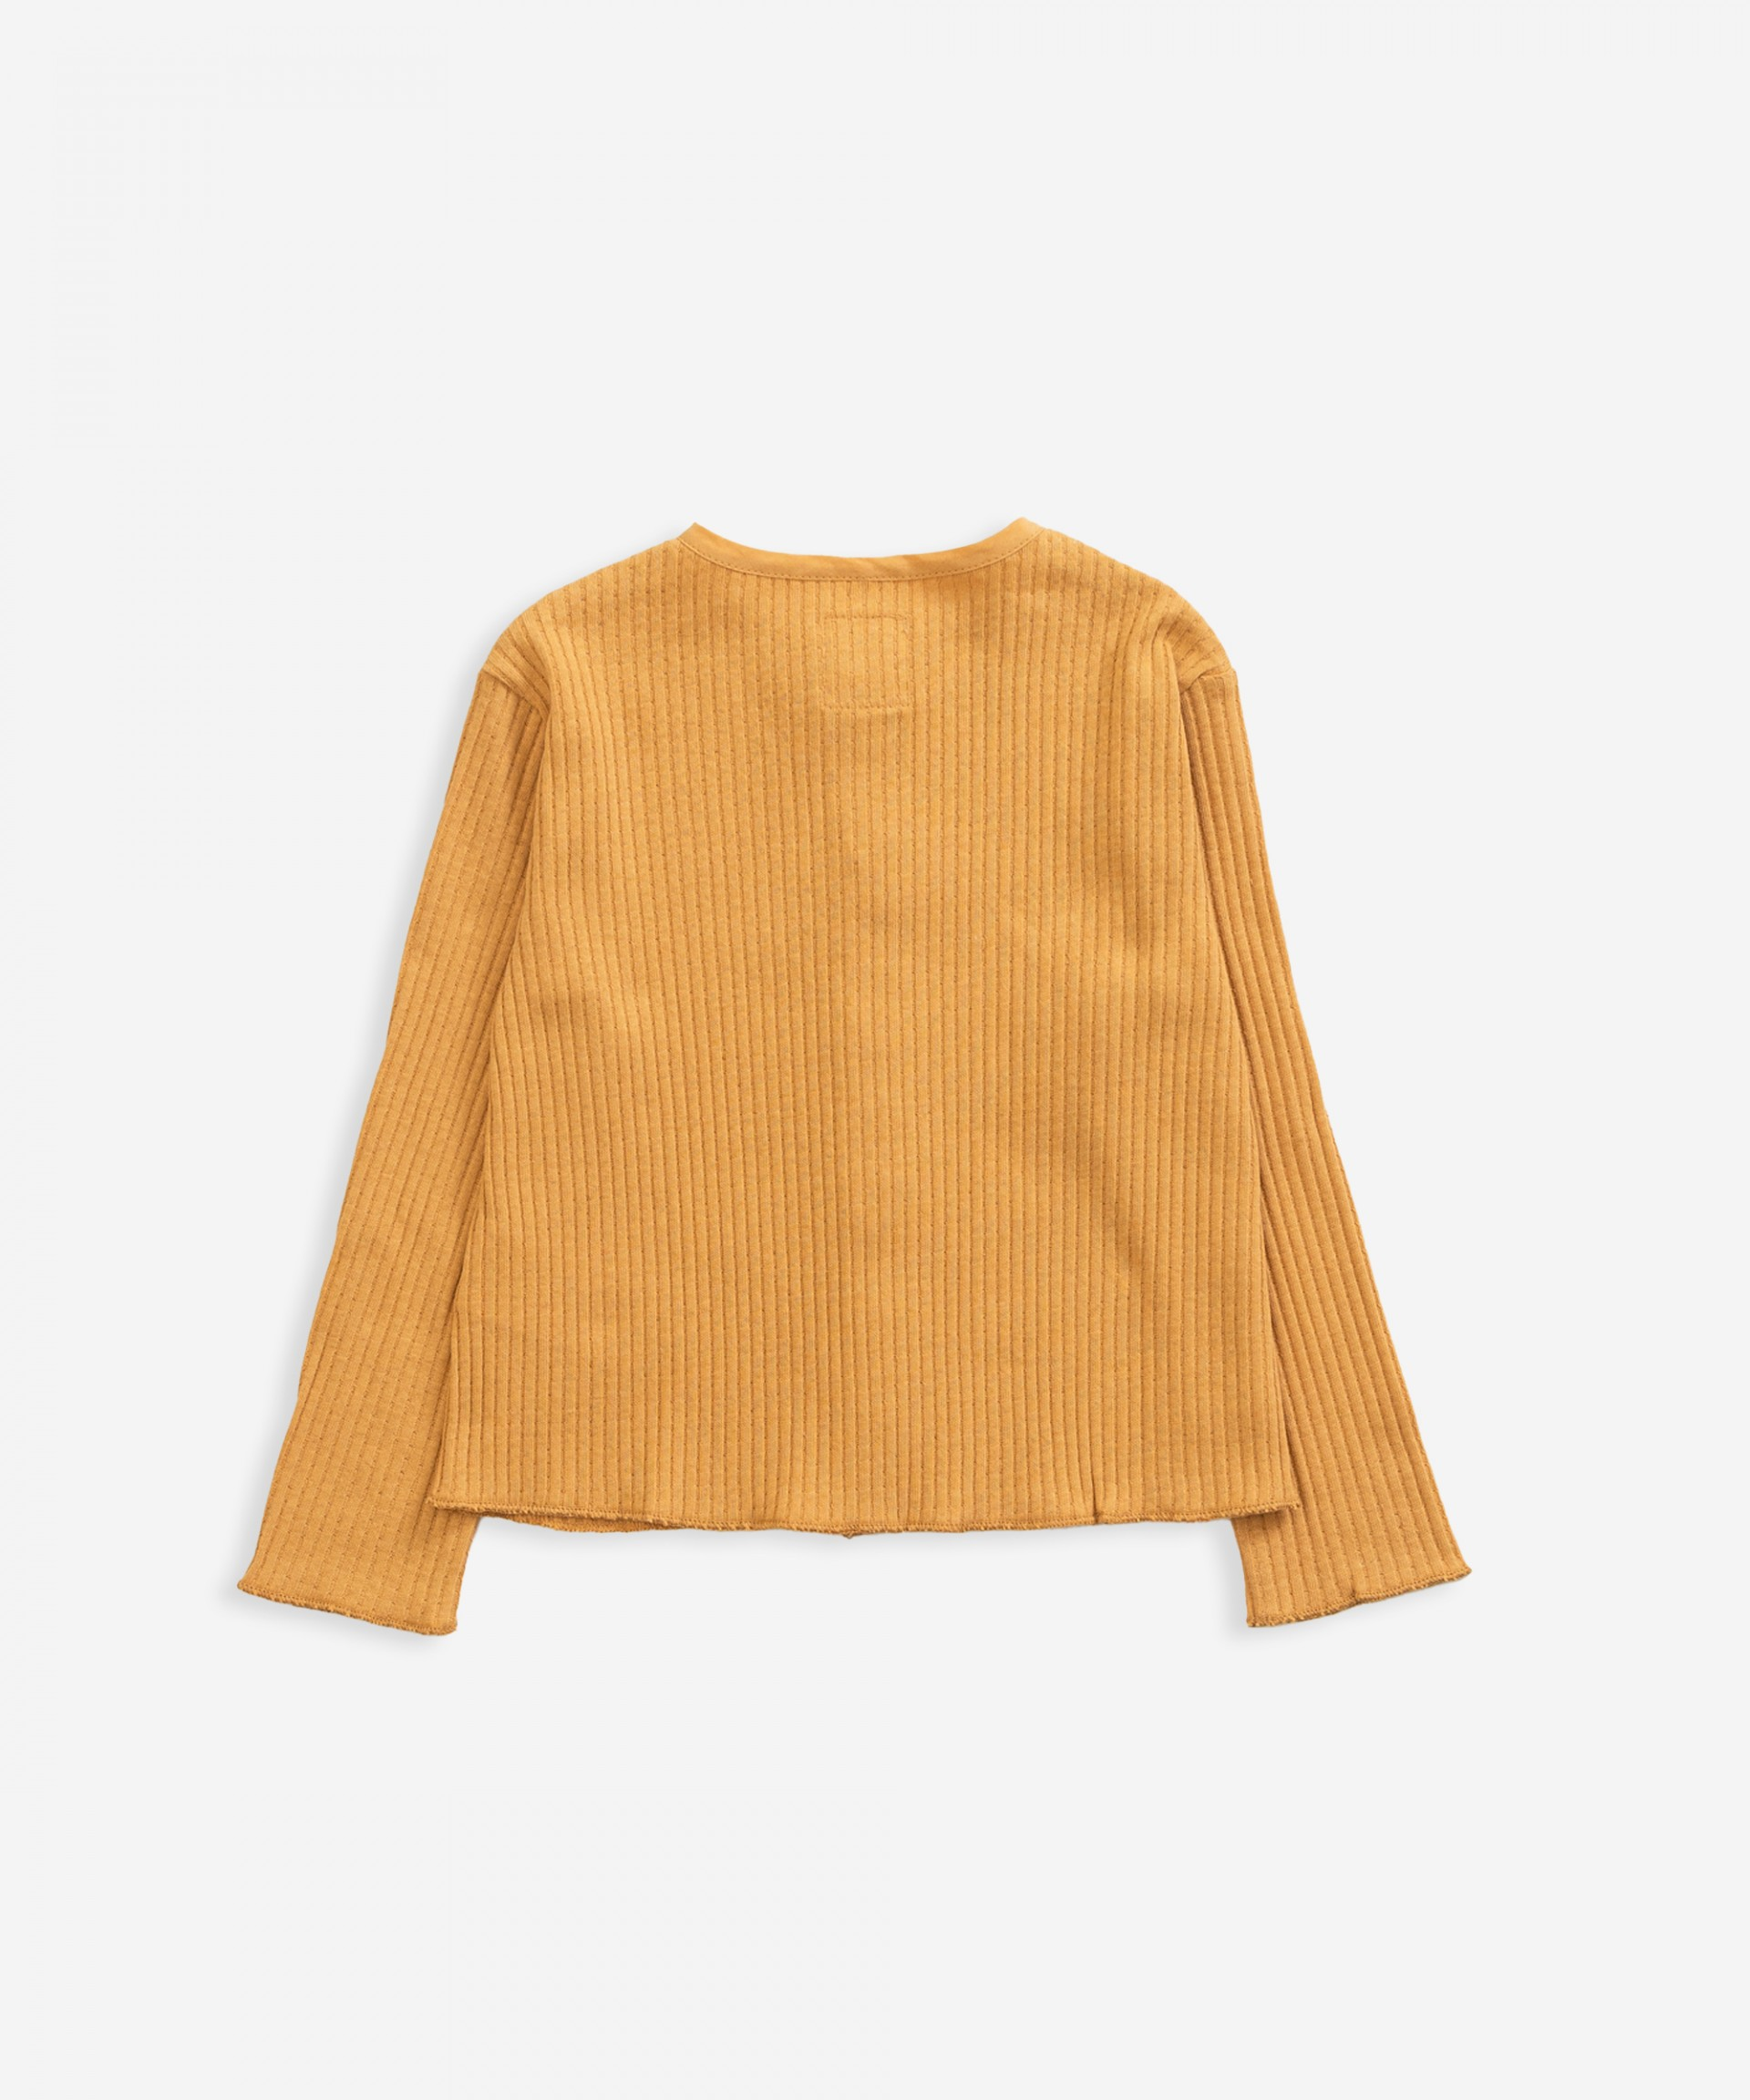 Casaco de malha | Weaving